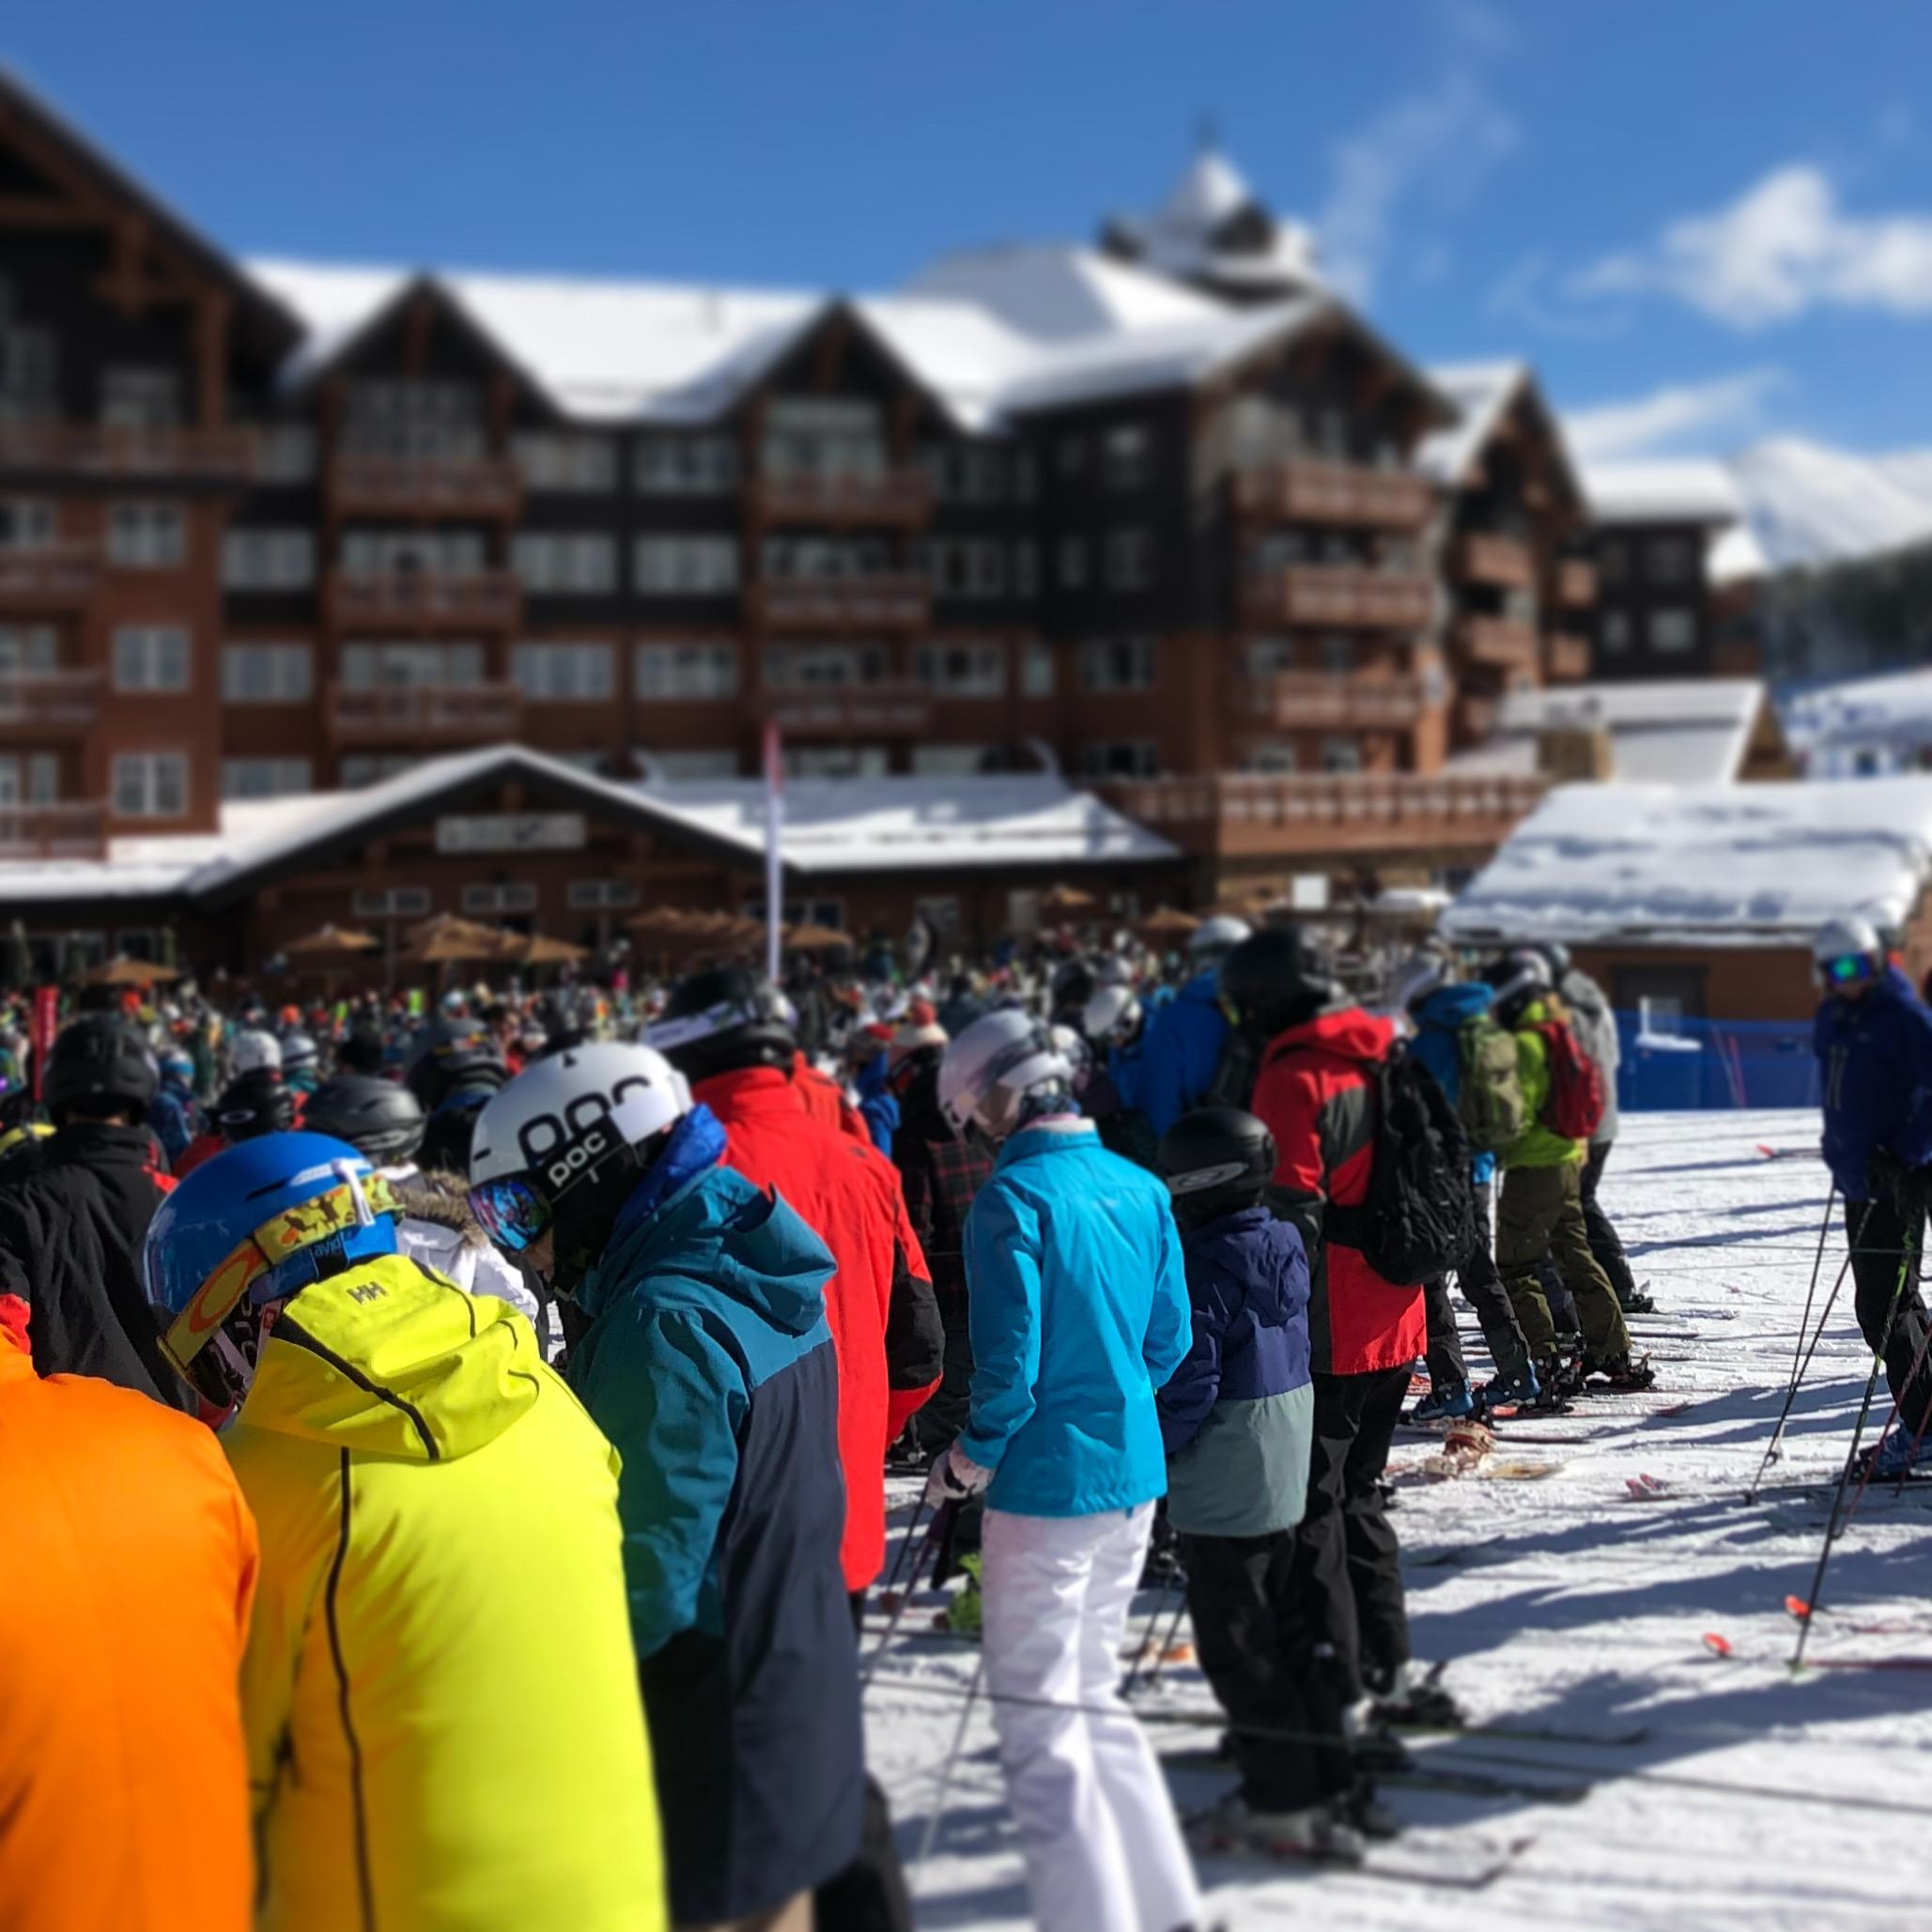 Crowds in line at Breckenridge ski resort